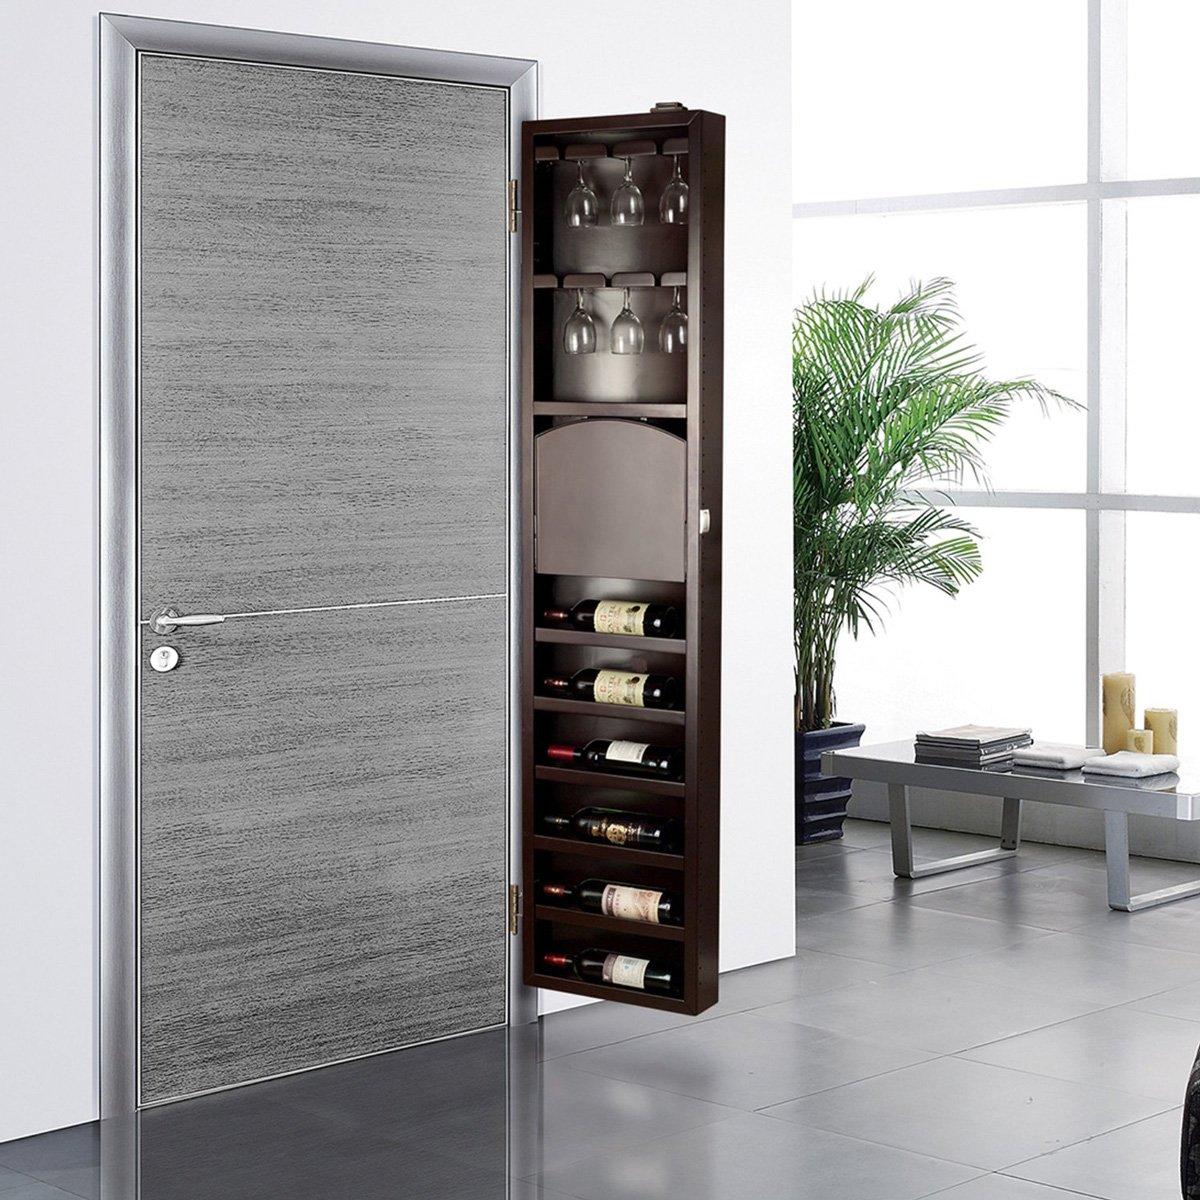 Wine Racks Kitchen Cabinets: Behind The Door Wine Storage Cabinet